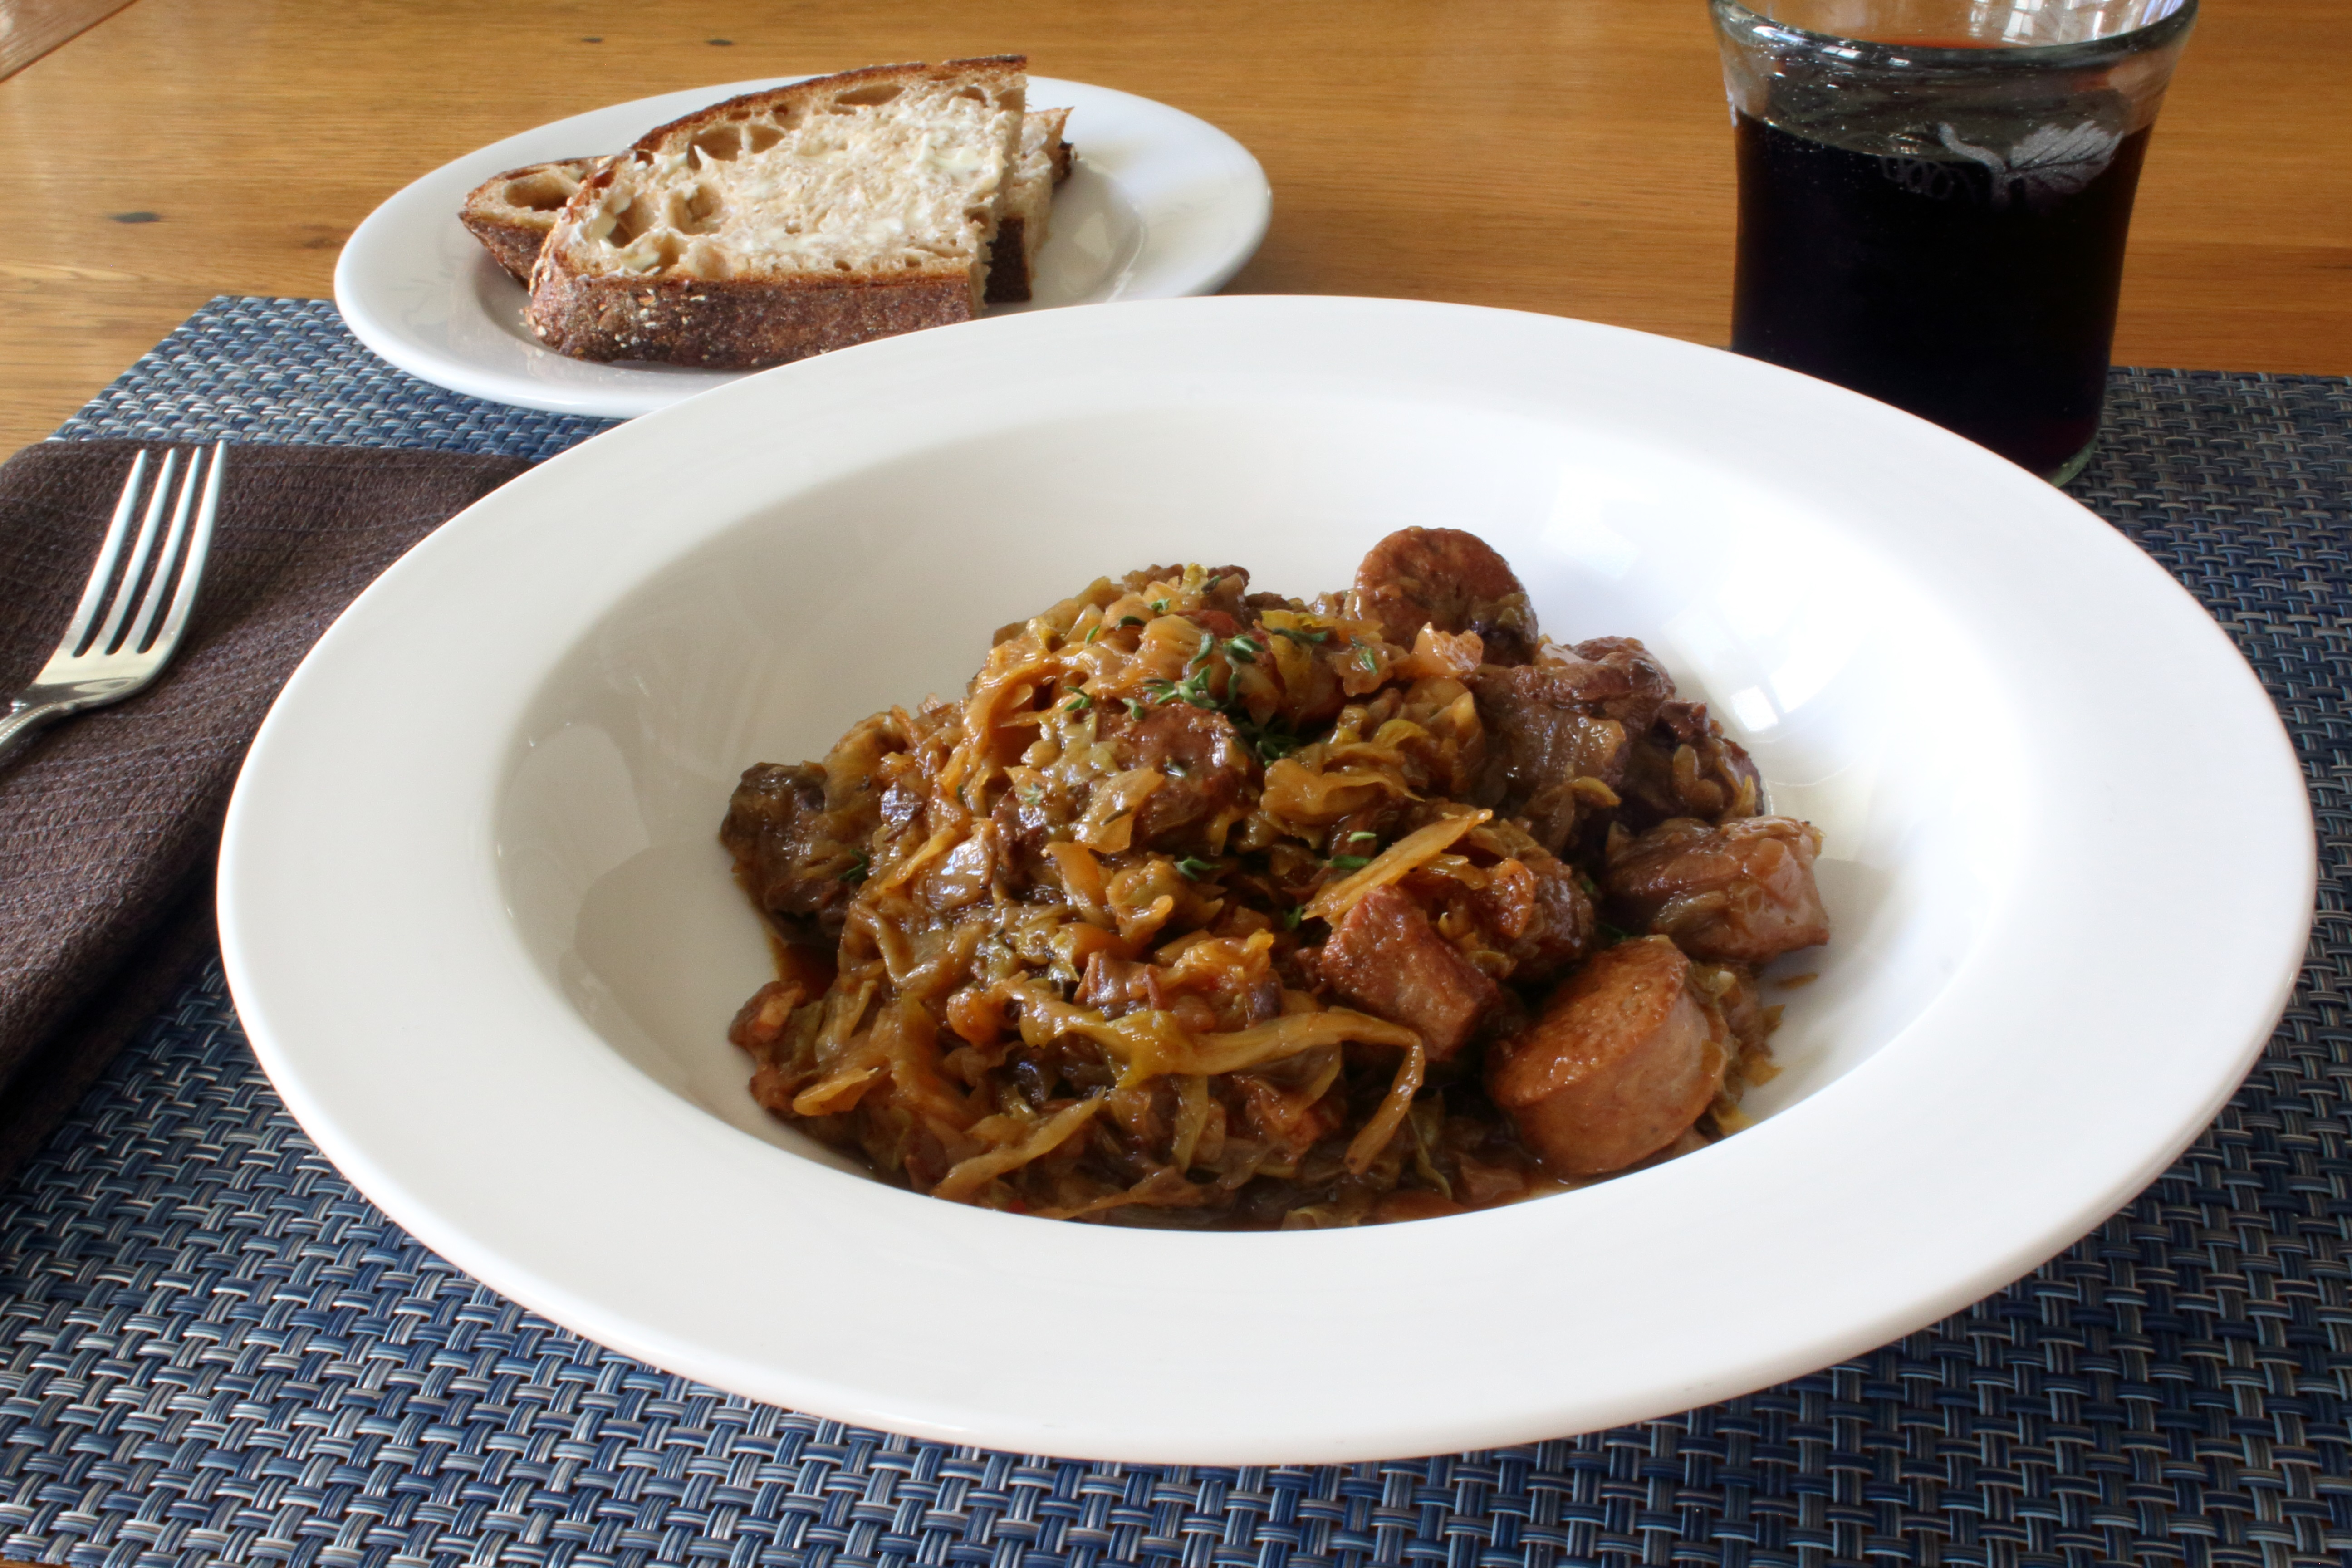 Chef John's Bigos (Polish Hunter's Stew)